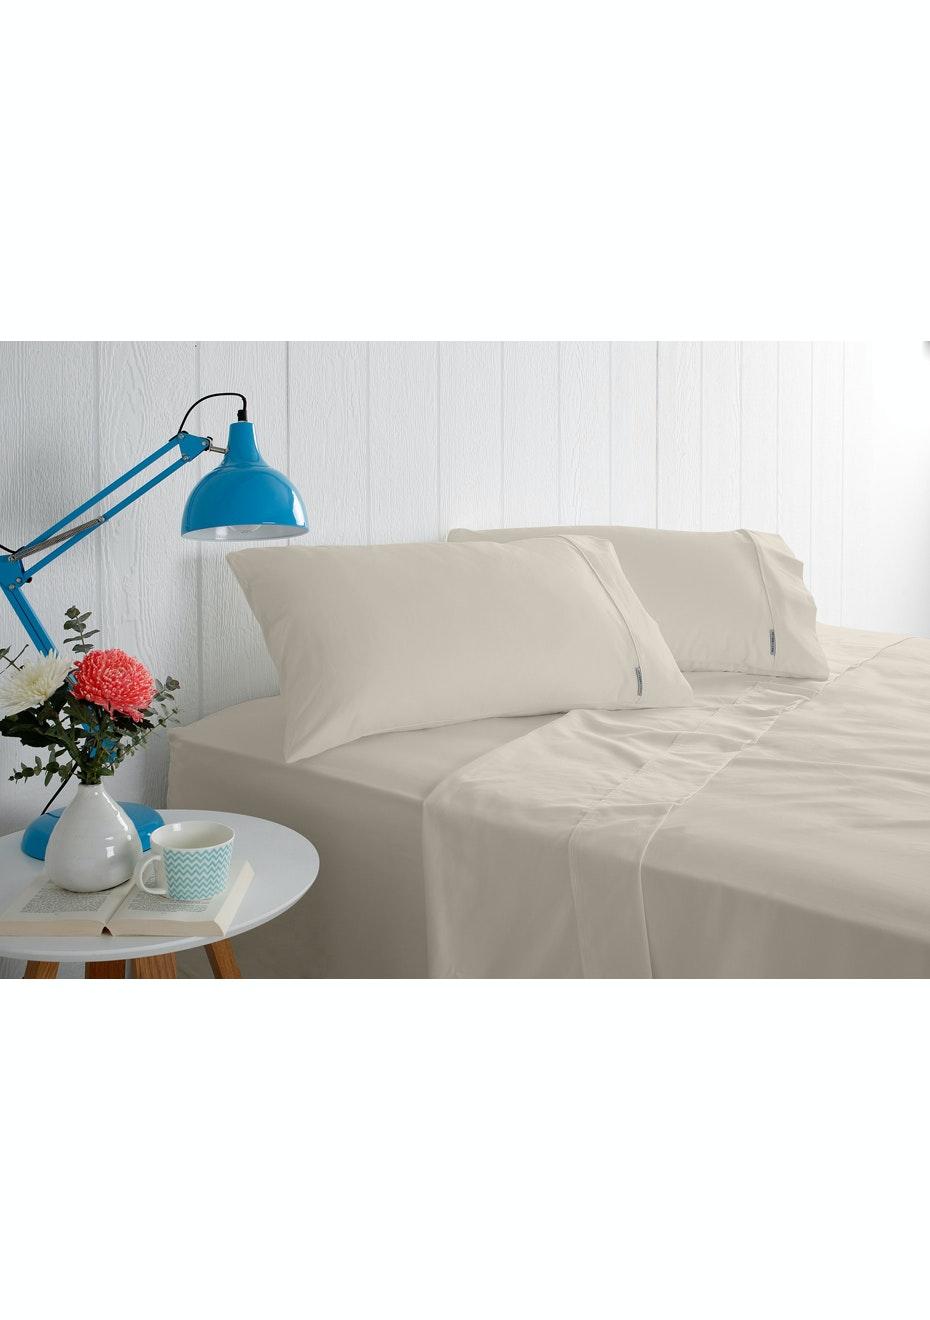 Odyssey Living 1000 Thread Count – Cotton Rich Sheet Sets - Linen - Queen Bed